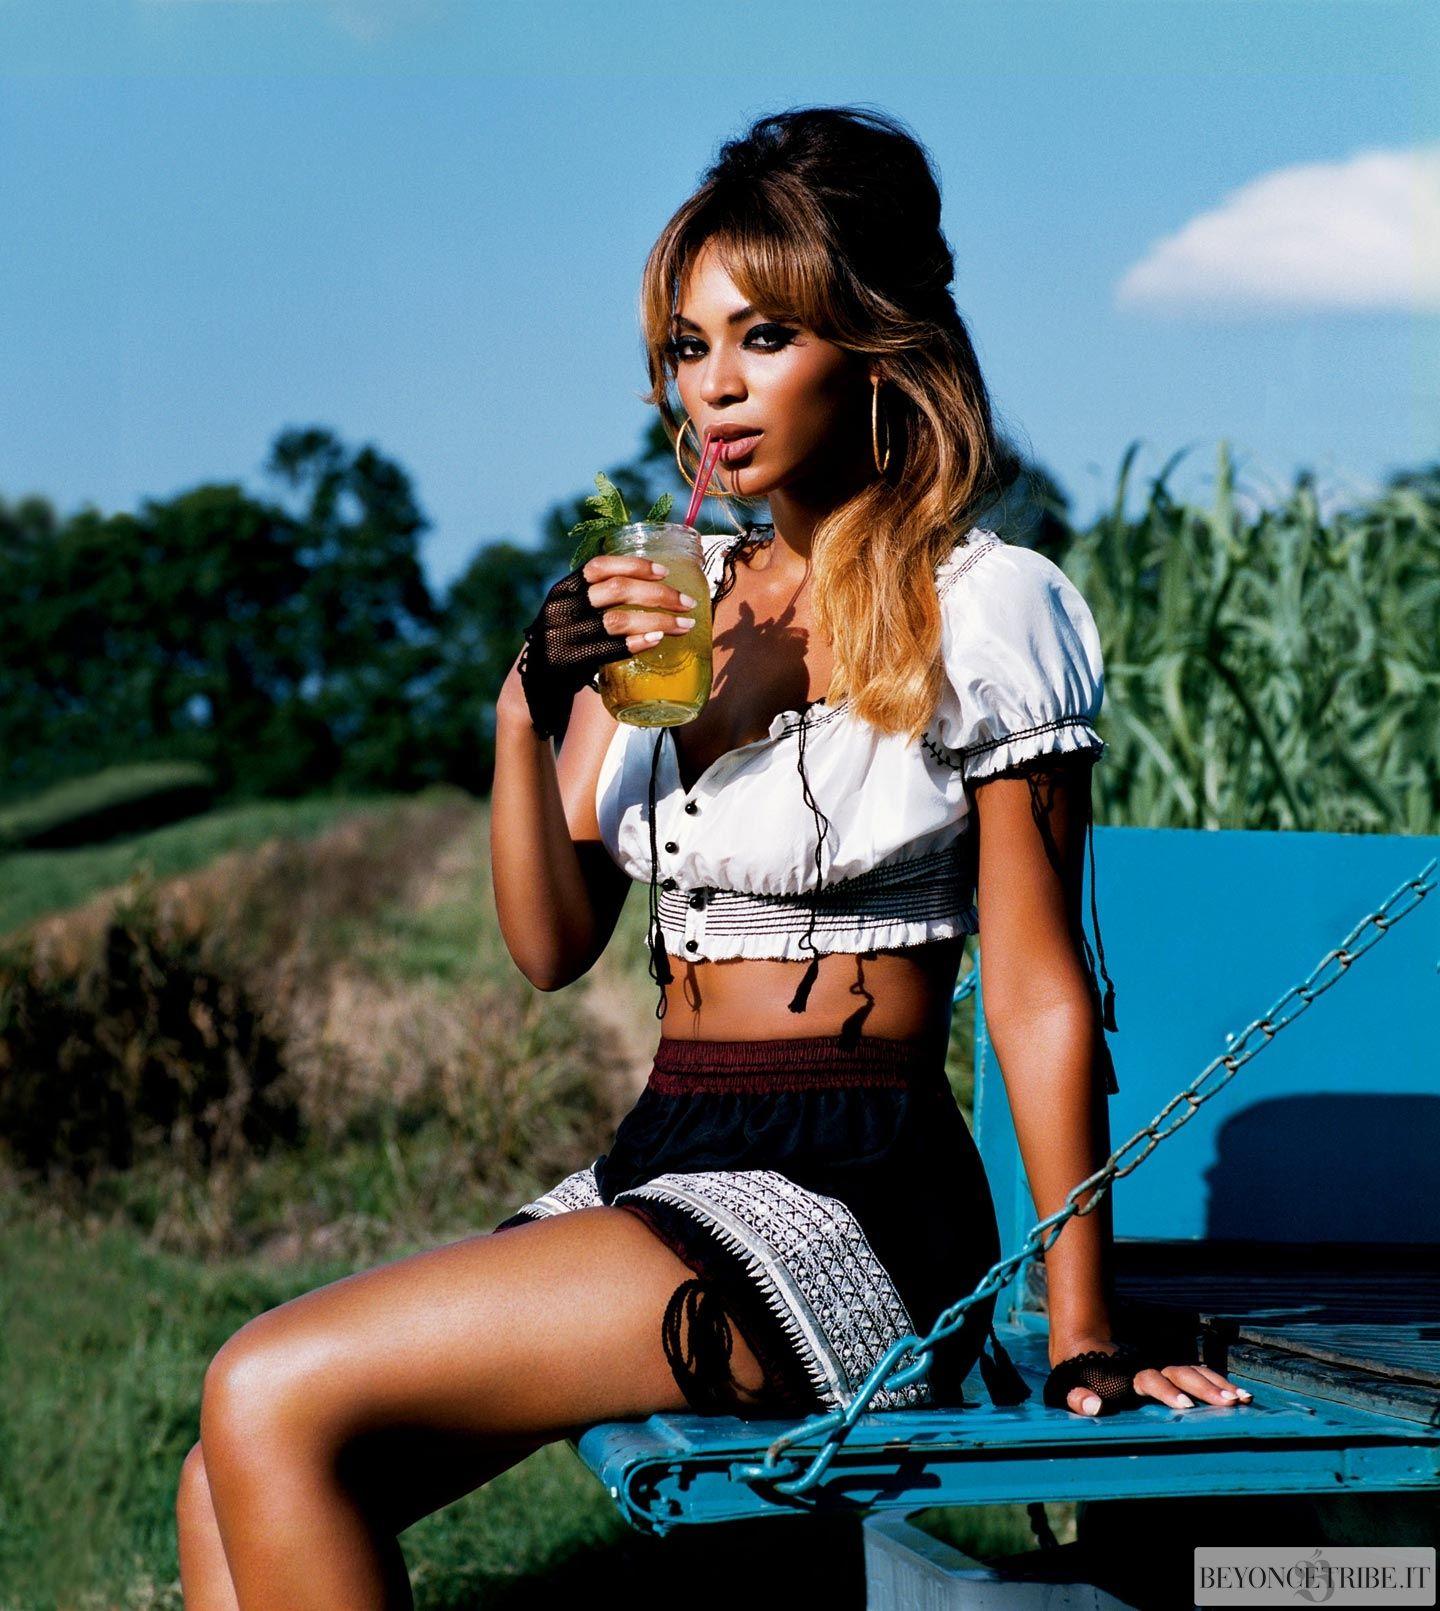 Google themes beyonce - Beyonce Photoshoot Google Search